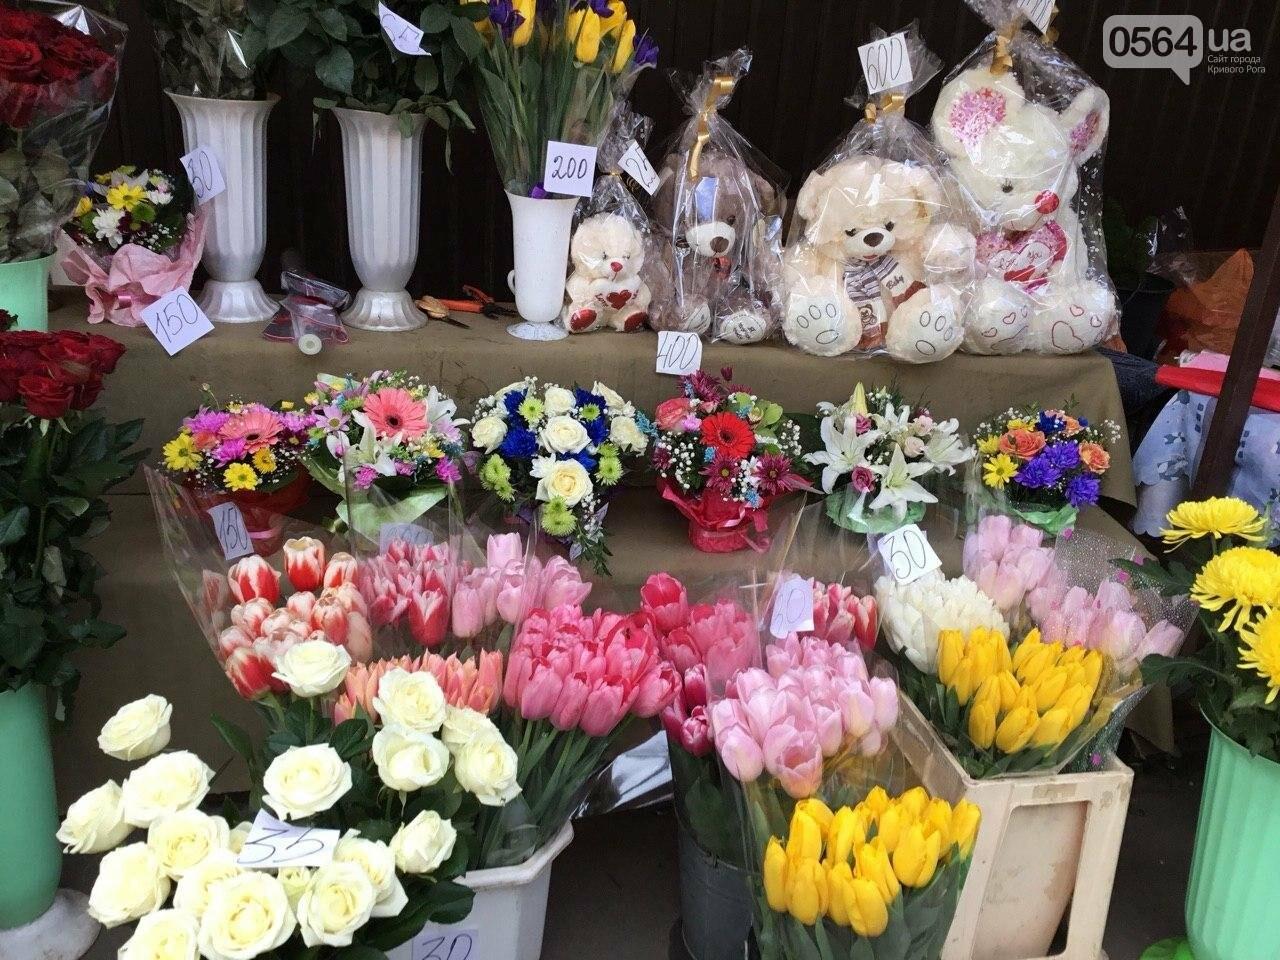 Сколько стоят примула, цикламен, мимоза? Обзор цен на цветы в Кривом Роге, - ФОТО, ВИДЕО, фото-17